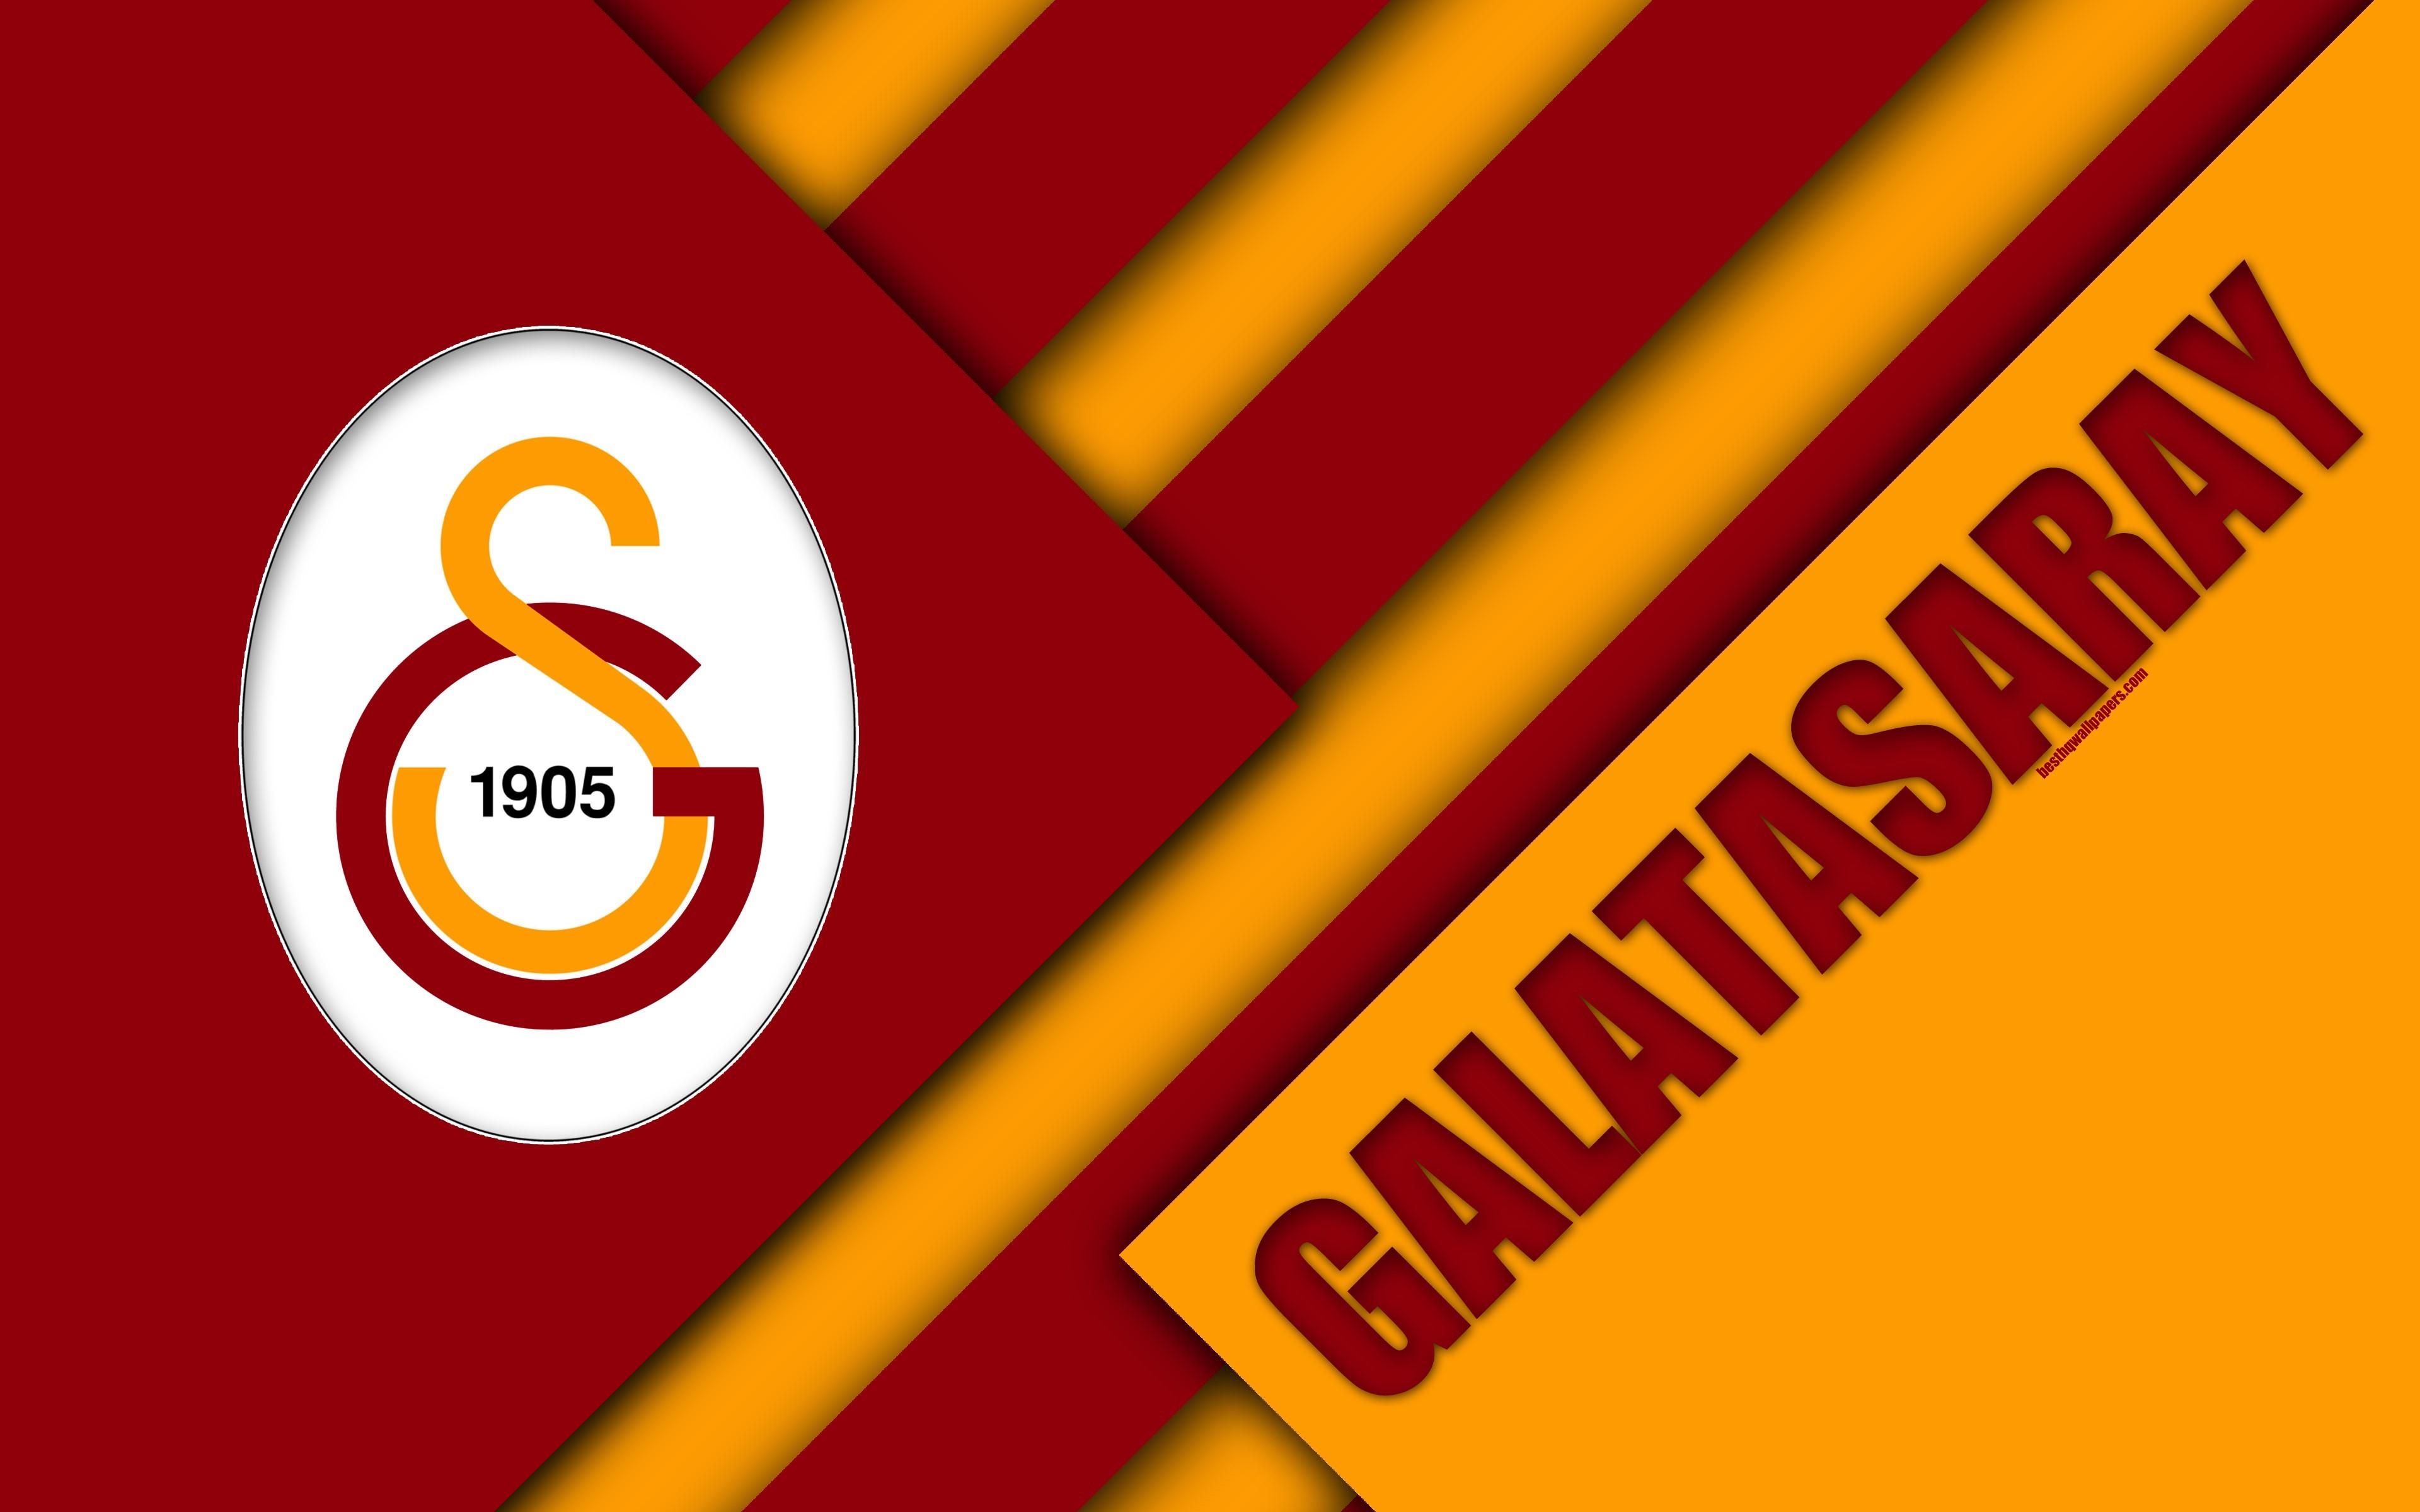 Galatasaray Duvar Kağıdı indir